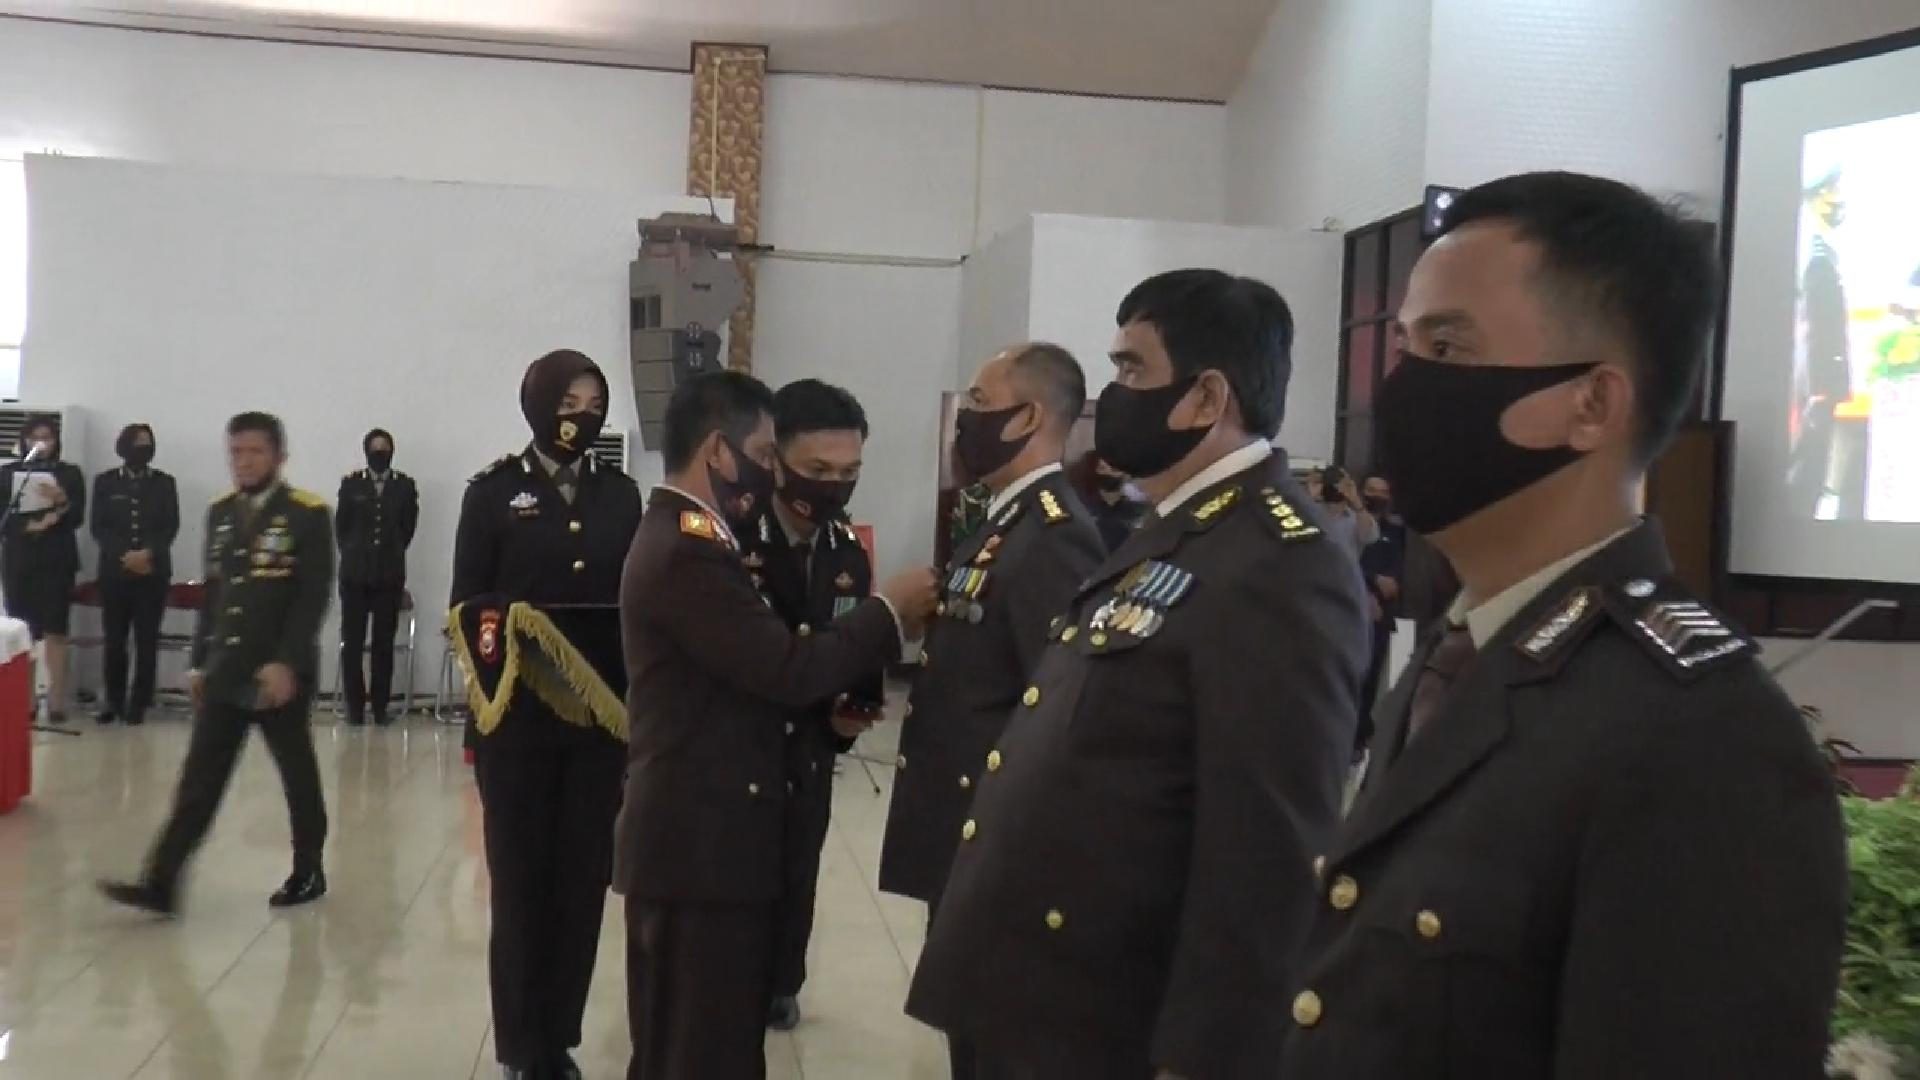 Terima penghargaan Kapolri Dalam Hari Bhayangkara Ke-74, Personil Polda Bengkulu Toreh 2 Pin Emas, 1 Perak dan 1 Perunggu